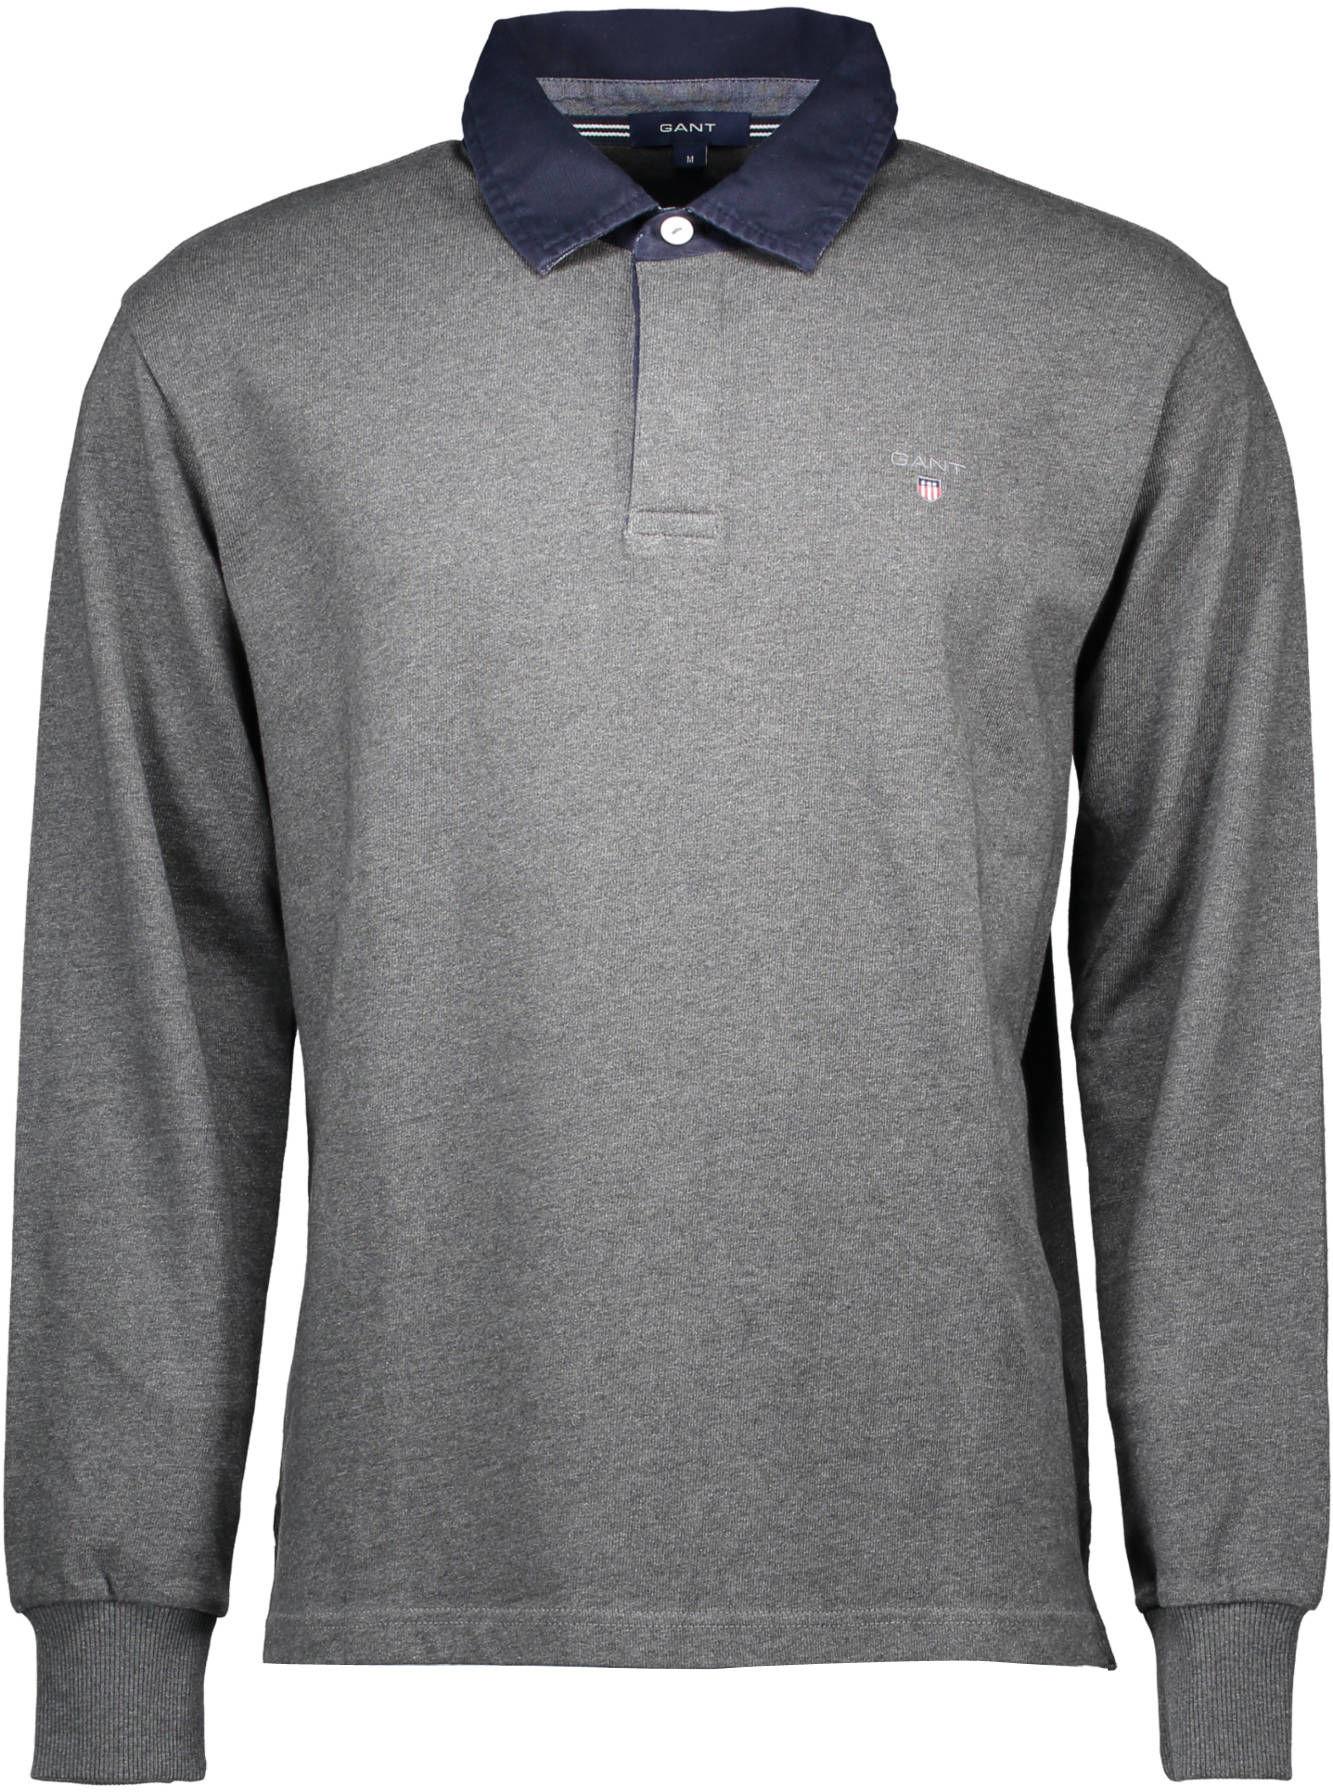 GANT Polo Shirt Long Sleeves Men